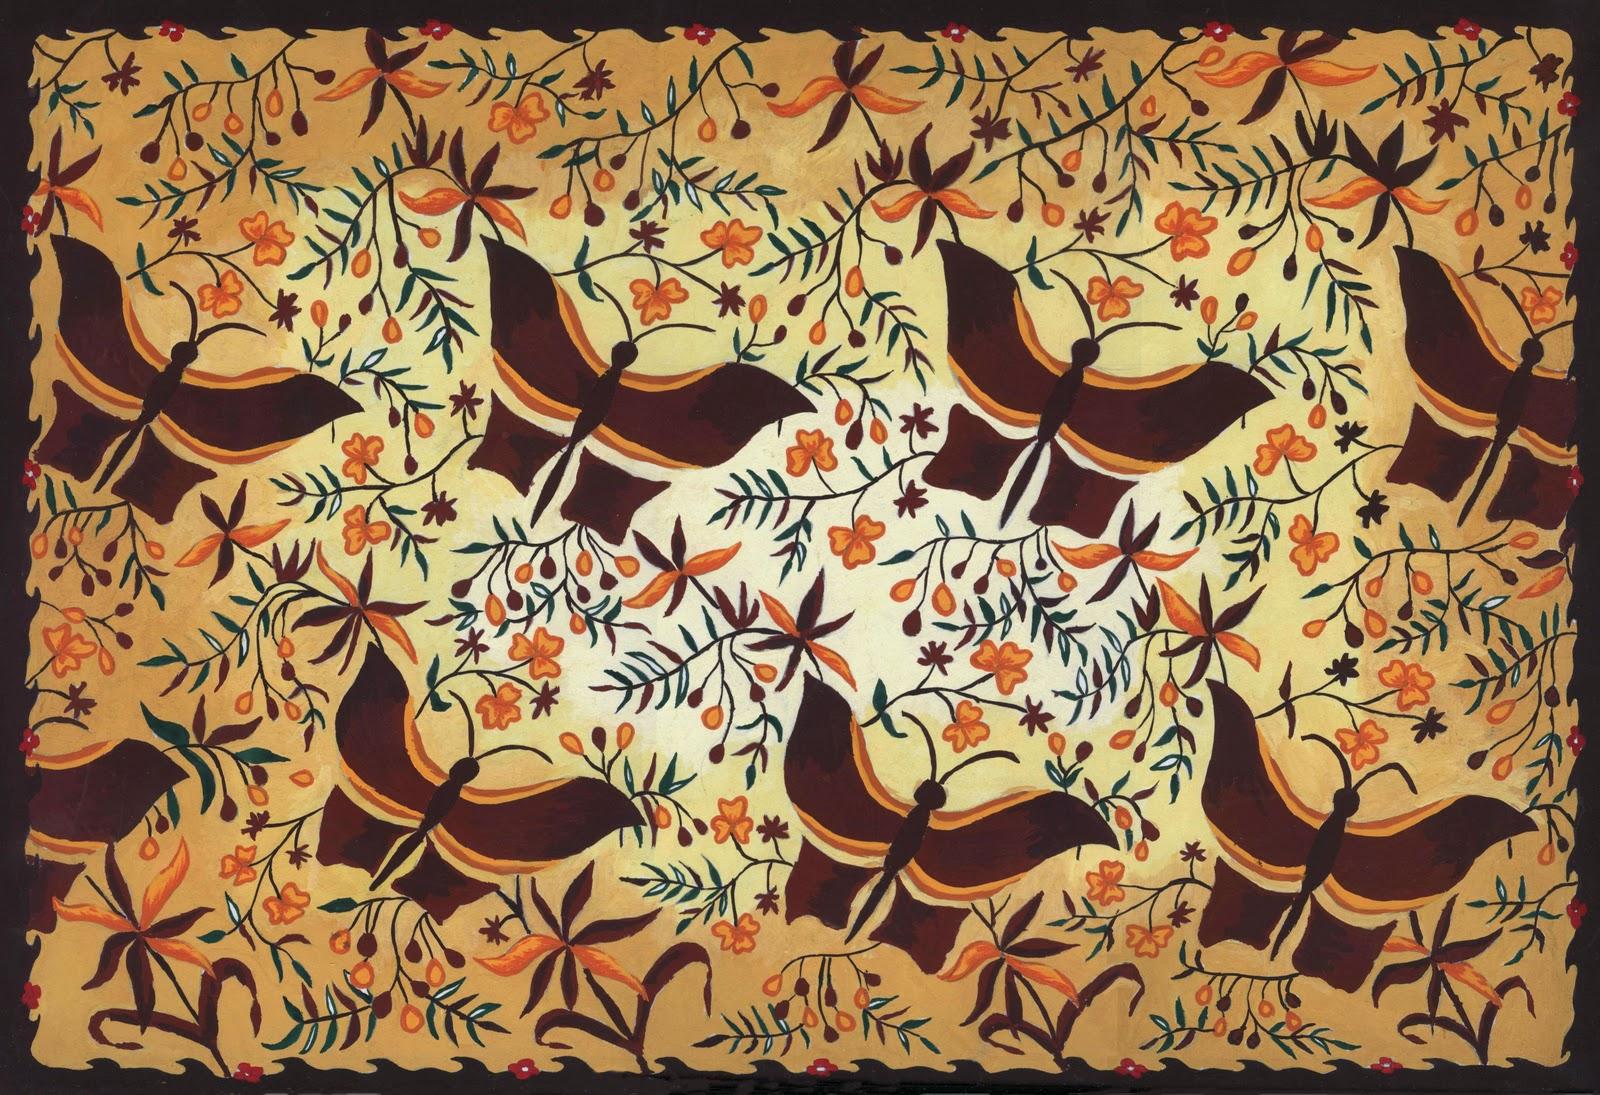 sejarah batik indonesia batik secara historis berasal dari zaman nenek ...